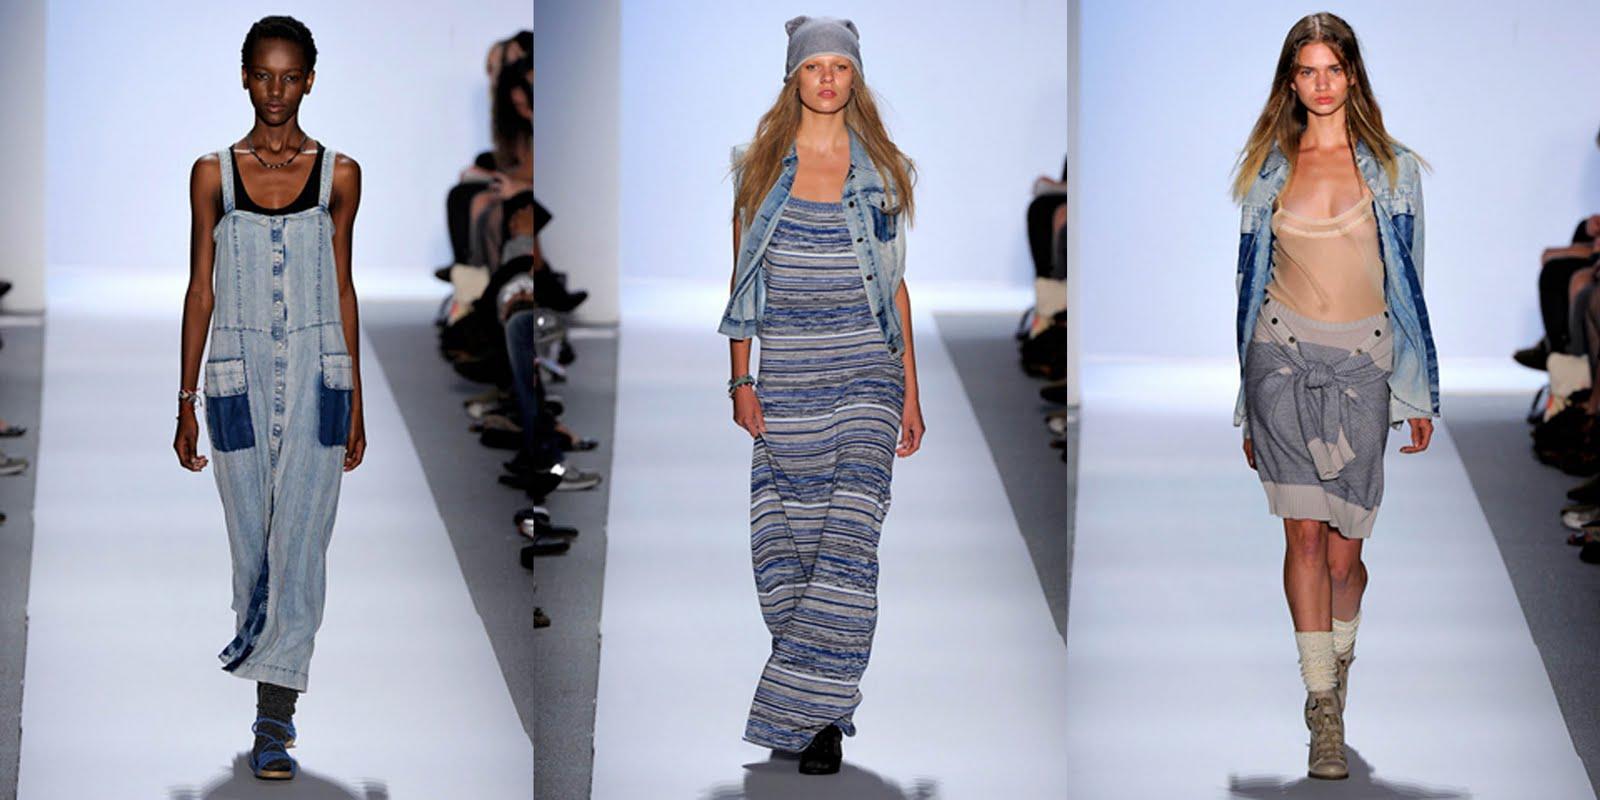 http://4.bp.blogspot.com/_coxNQvJjwWk/TKThcTHslnI/AAAAAAAABnE/Jr9D6W12jJI/s1600/charlotte+ronson2.jpg